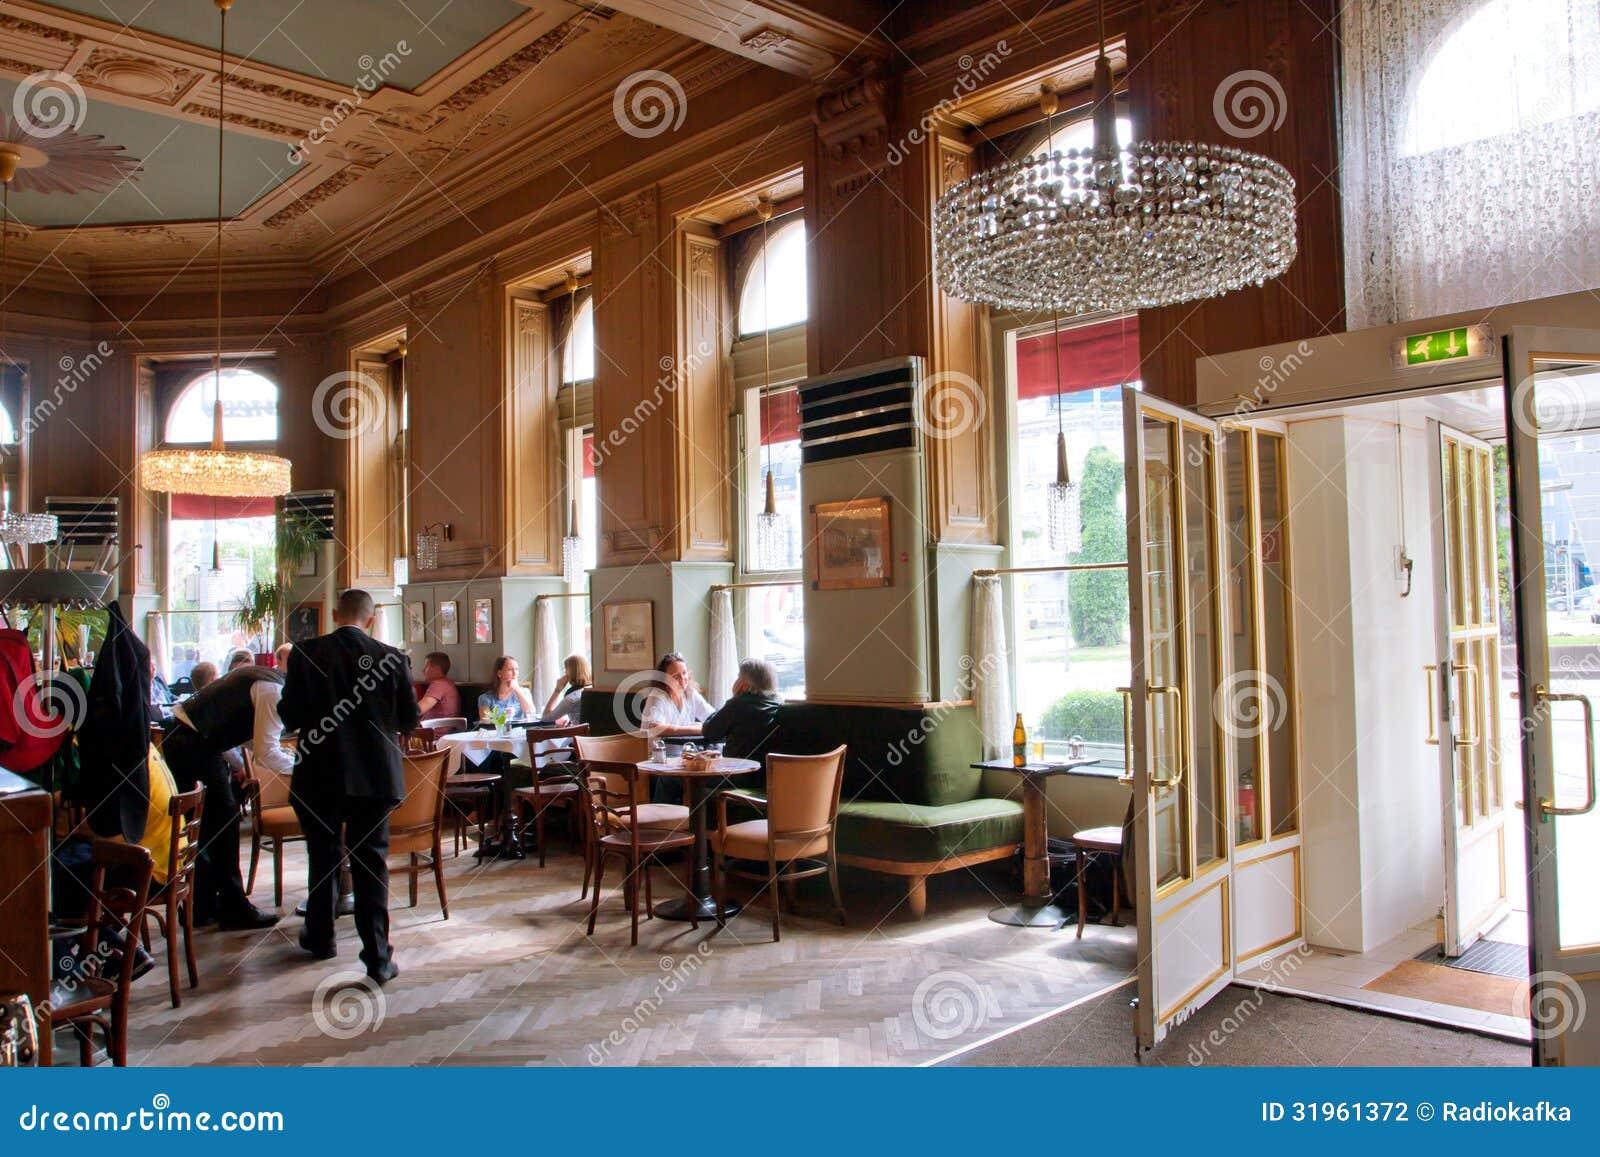 Interior design and visitors of cafe in vienna editorial for Interior design wien